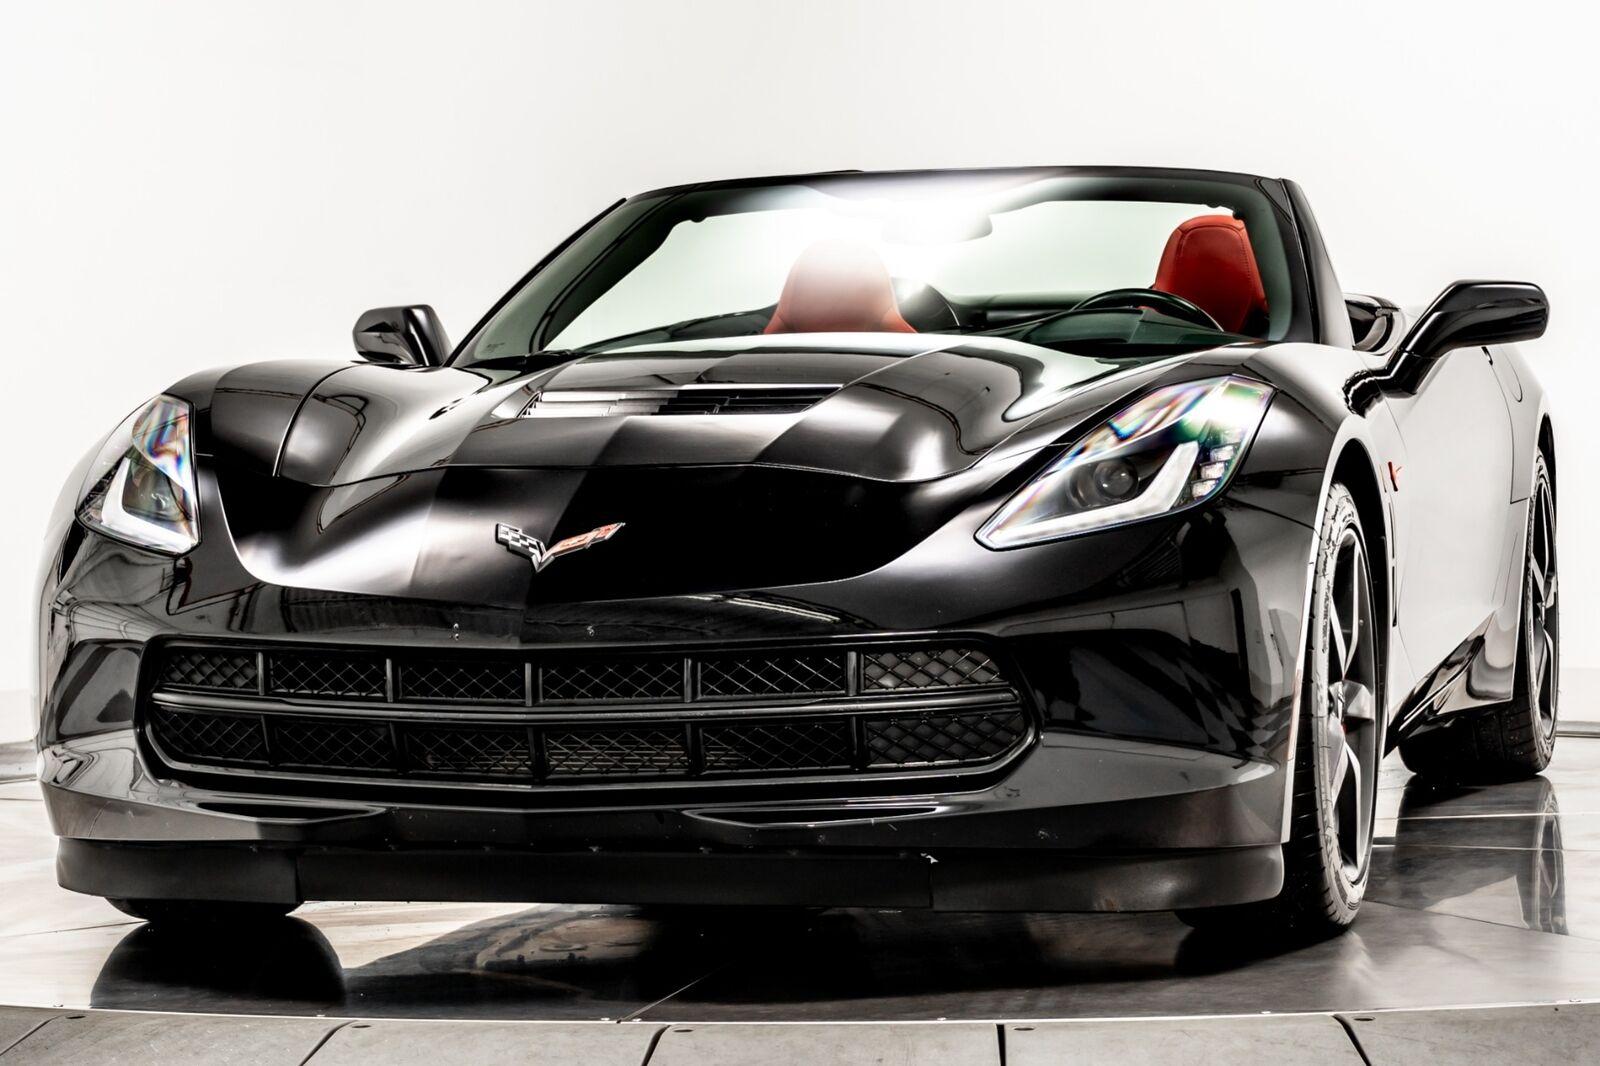 2014 Black Chevrolet Corvette Convertible 2LT   C7 Corvette Photo 4